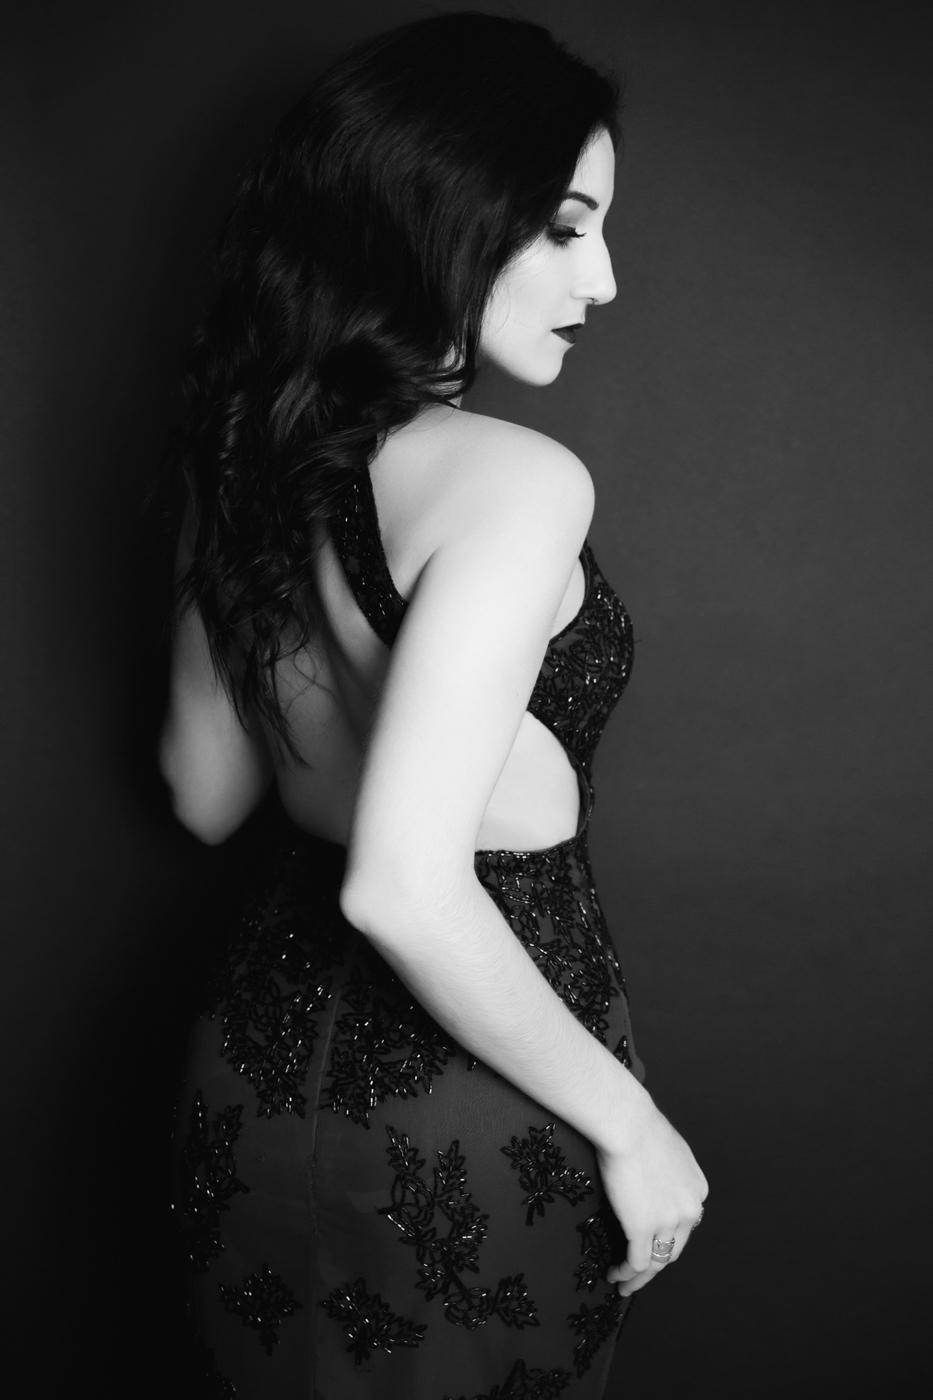 Jessica-Daniel-Engagement-Photo-Shoot-in-the-heart-of-Washington-DC-Ksenia-Pro-Photography-12